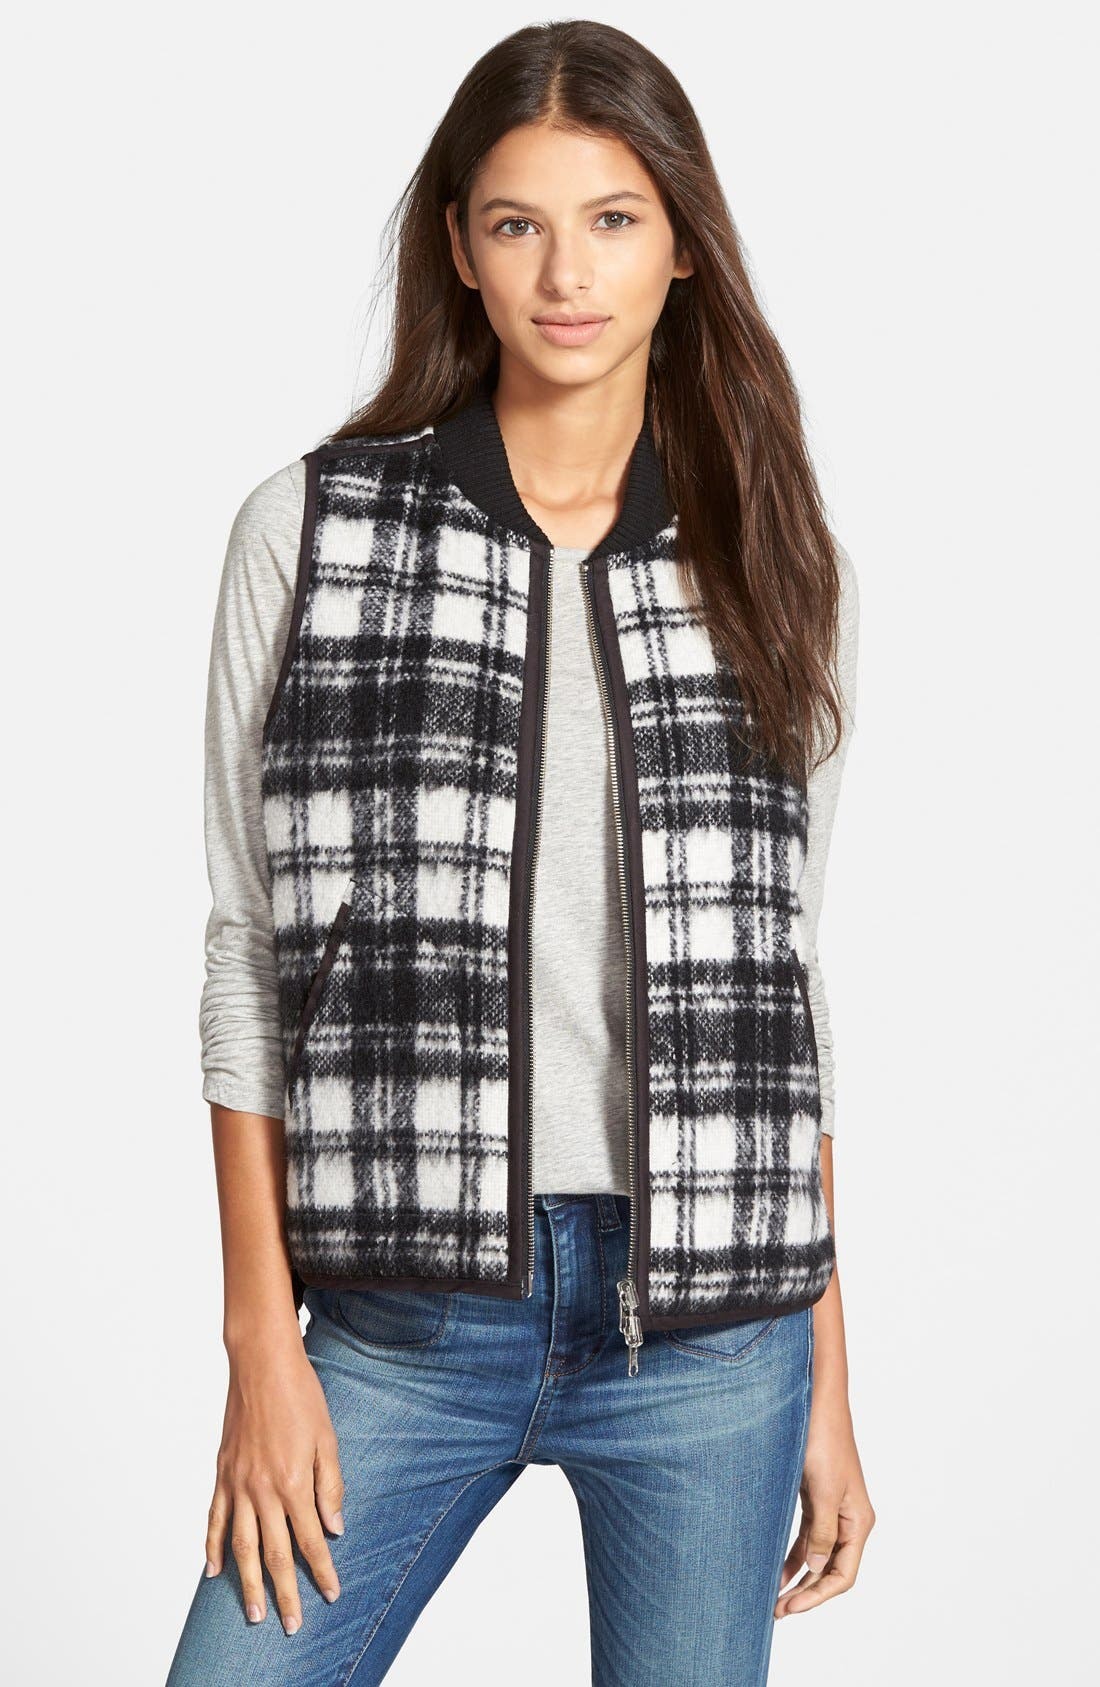 Alternate Image 1 Selected - Madewell'Copeland Plaid' Reversible Vest